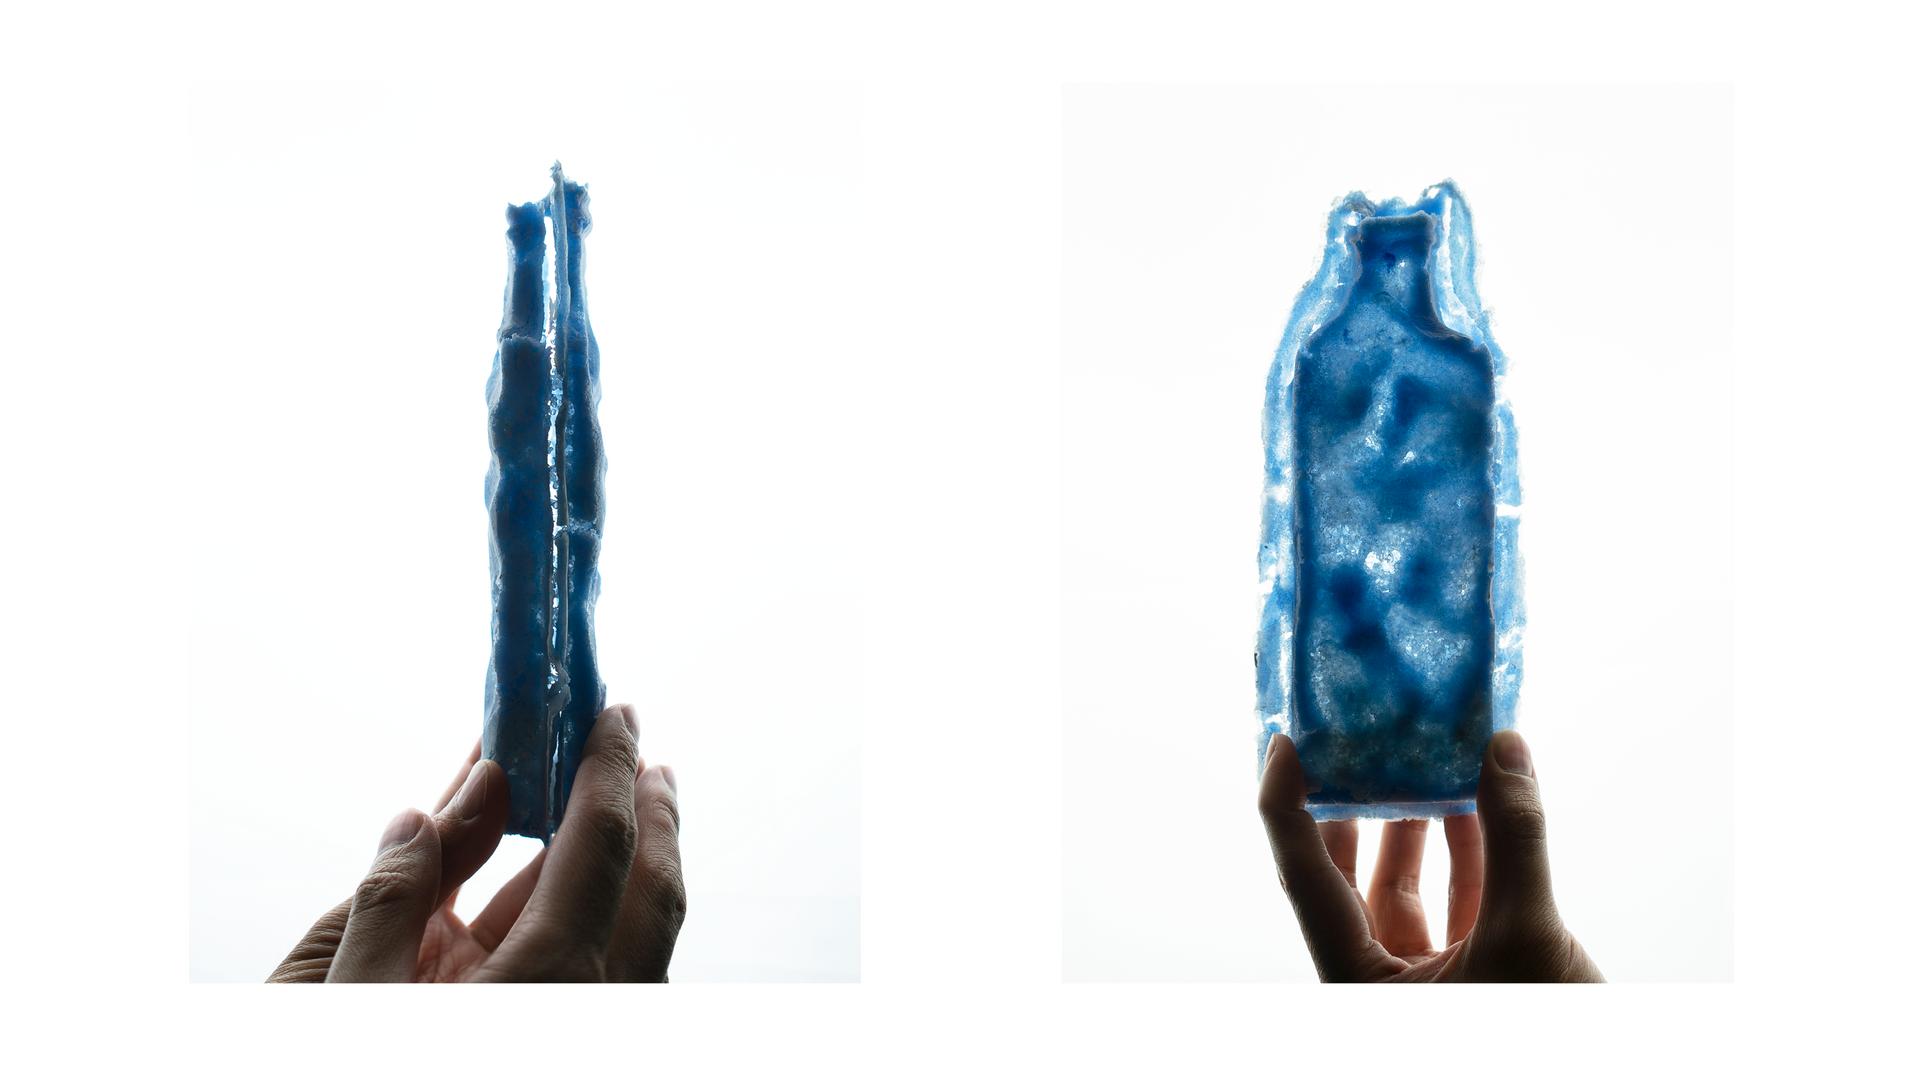 Blue VI, Pate de Verre, 20 x 8.5 x 3.5 cm